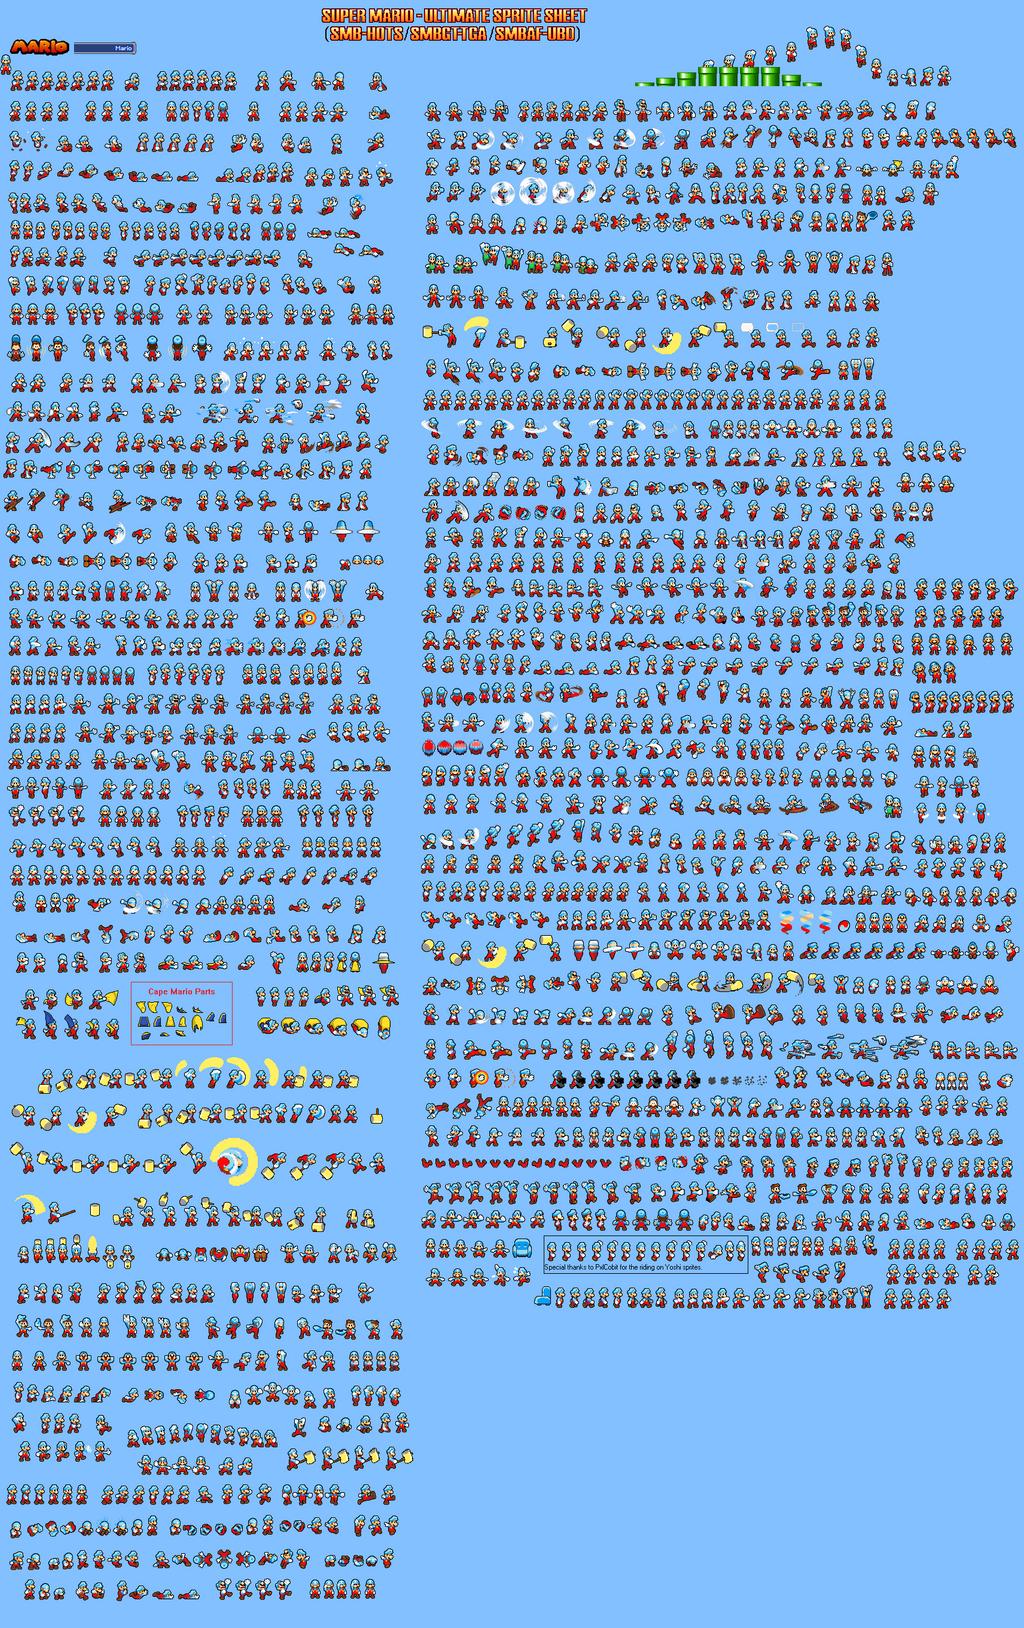 Ice Mario Sprite Sheet (SMBHotS) by KingAsylus91